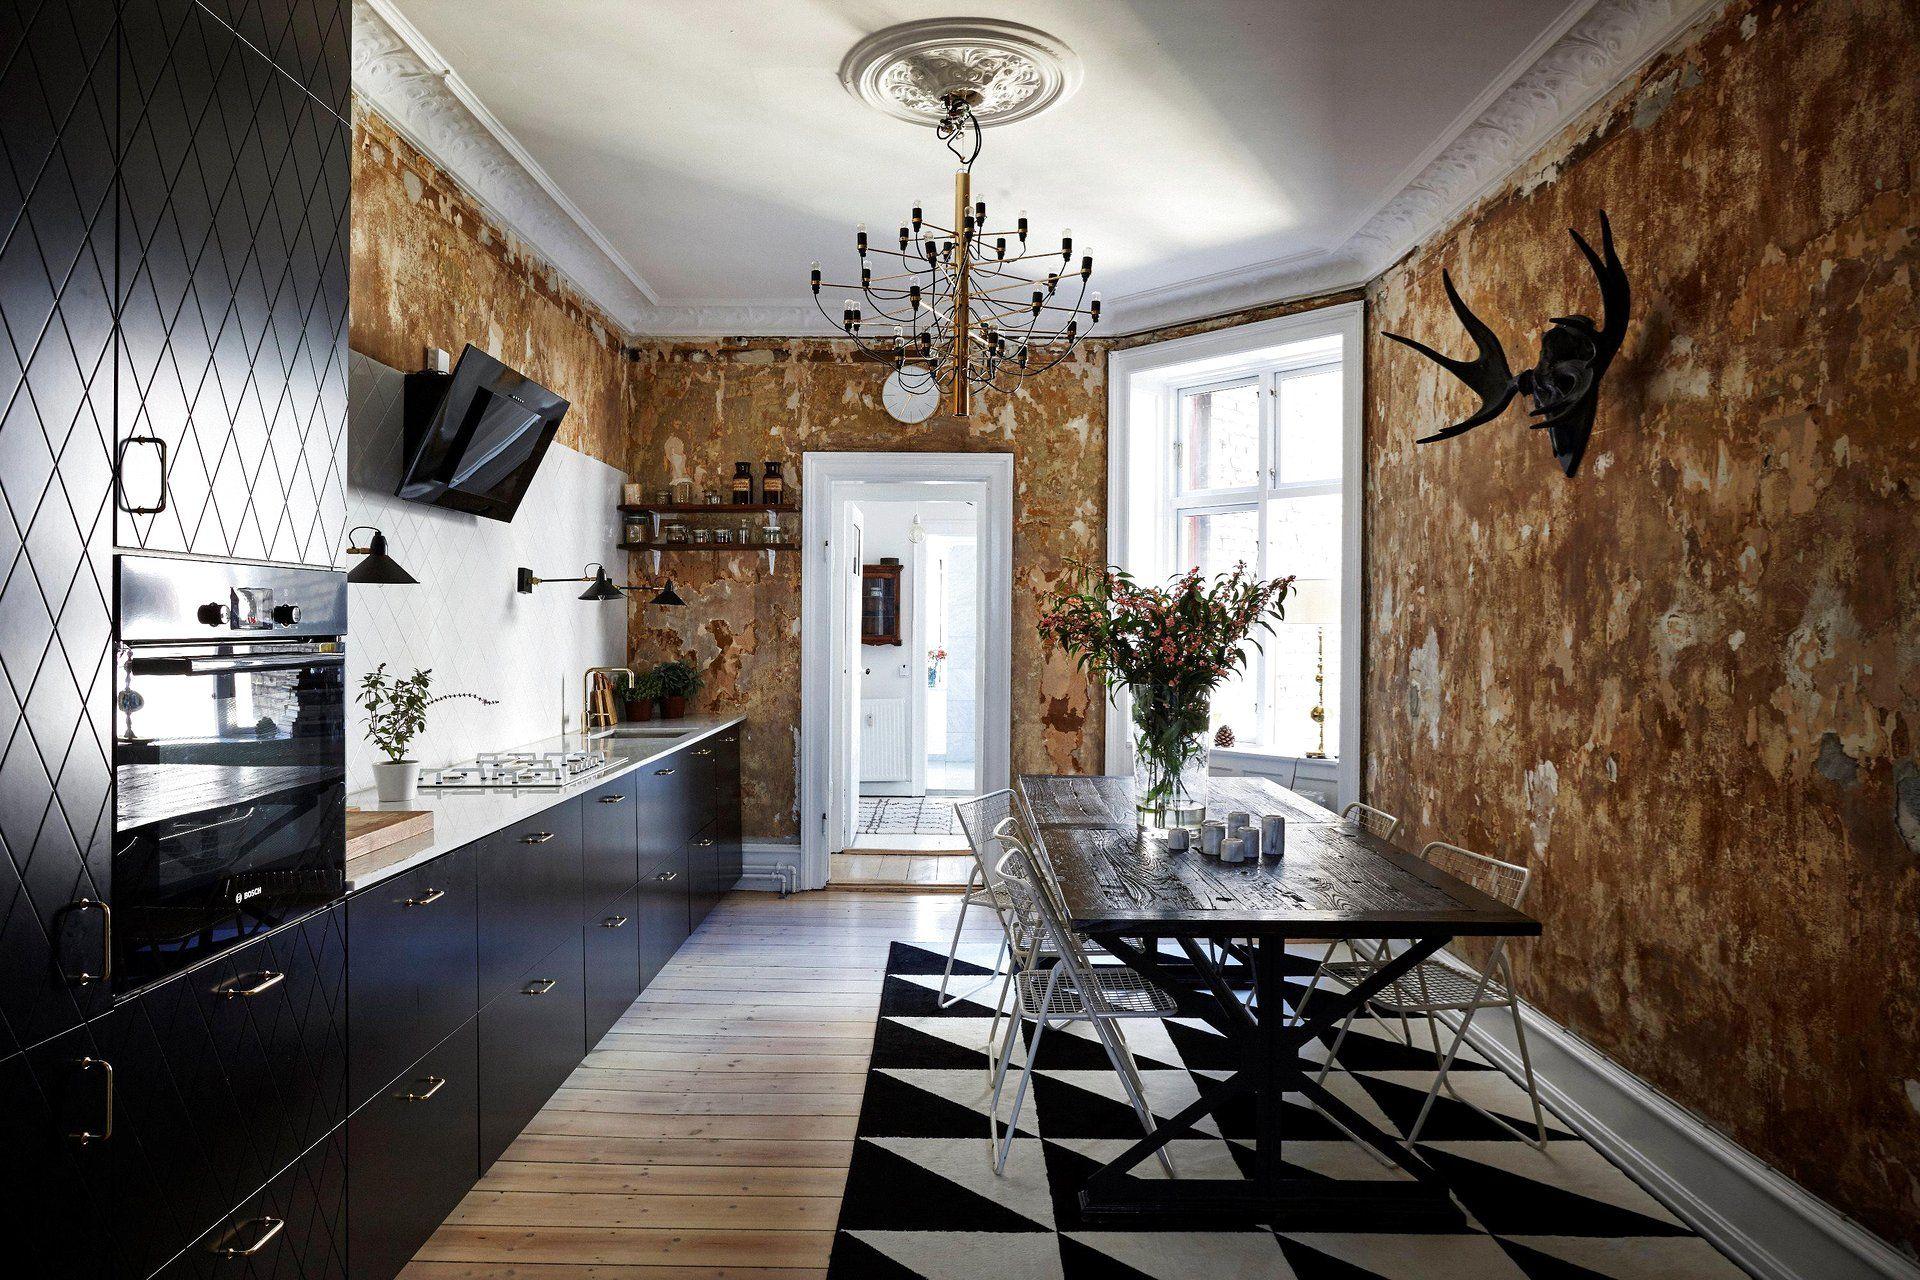 A Copenhagen Home With A Parisian Vibe Kitchen decor